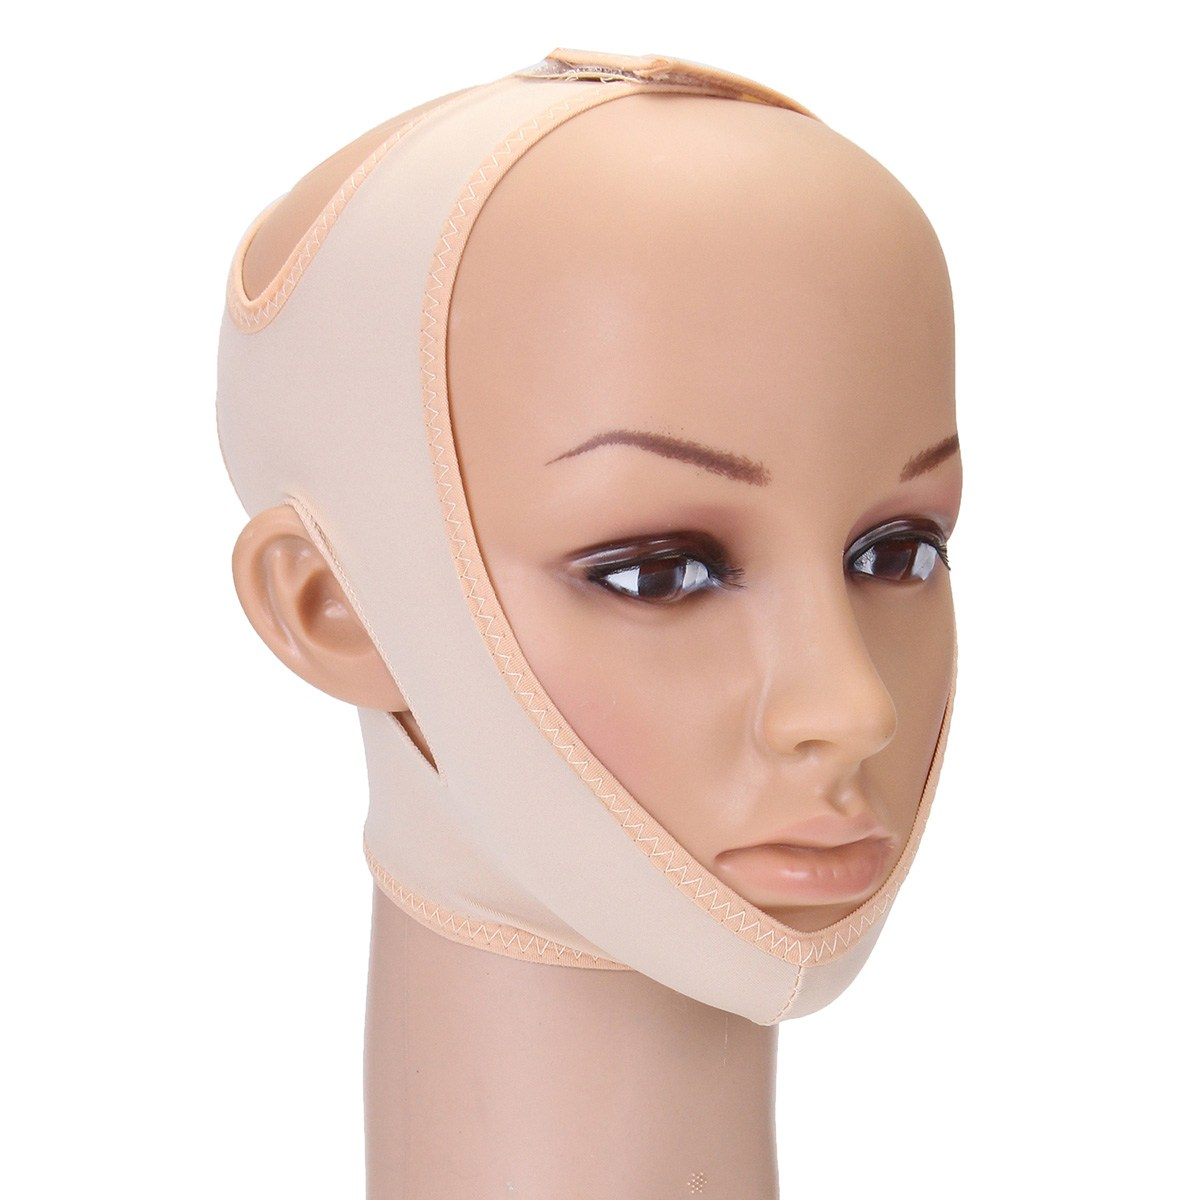 Angkat Dagu Pipi Tipis Anti Kerut Tali Masker Wajah V Line Band Tirus Bioaqua Shaped Penirus Pembentuk Pelangsing Perban Relaksasi Mengangkat Sabuk Mengurangi Ganda Chin